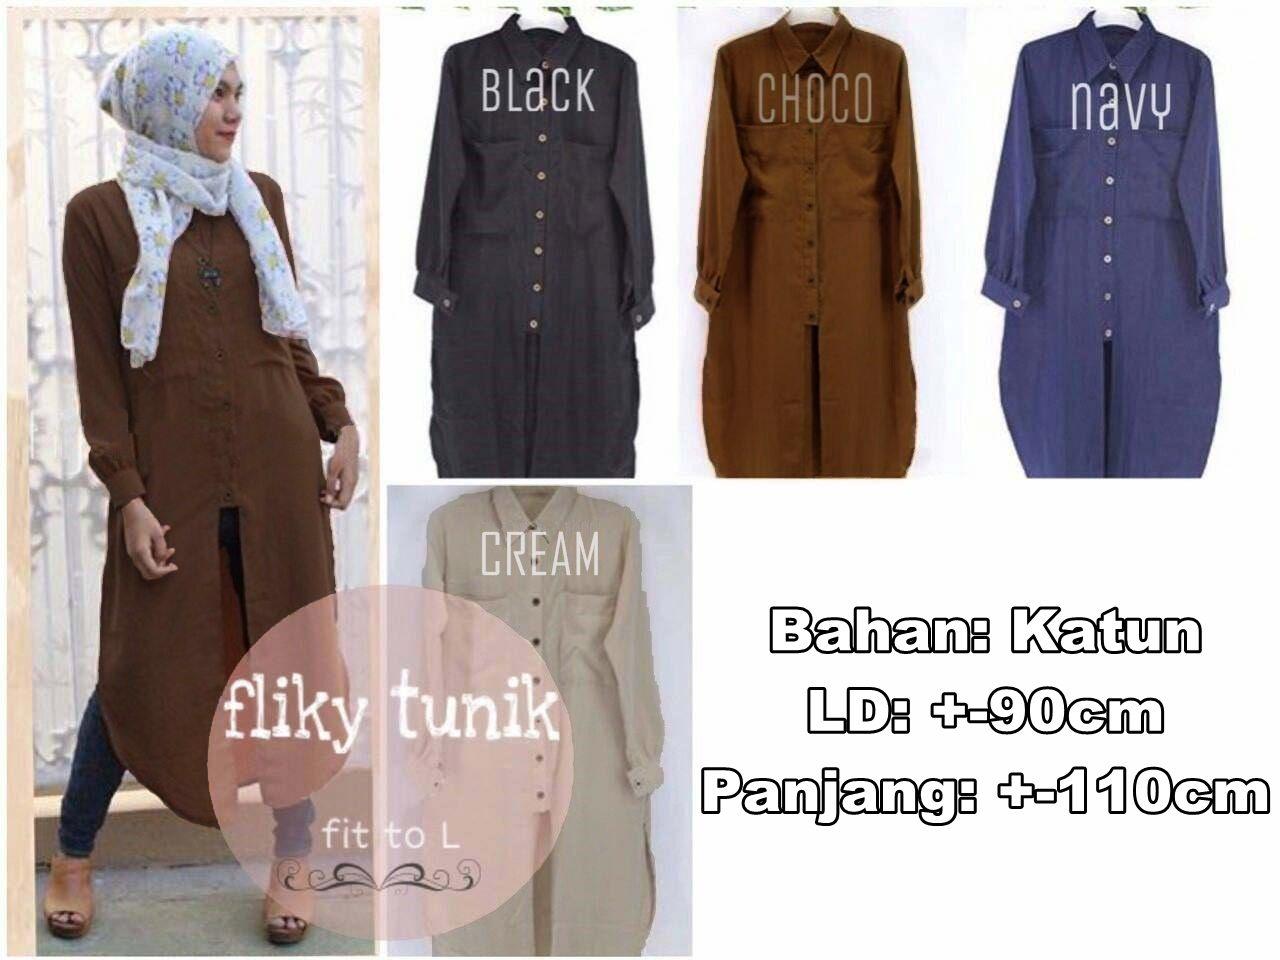 flicky tunic / tunik hijab terbaru murah / baju menyusui / dress hitam